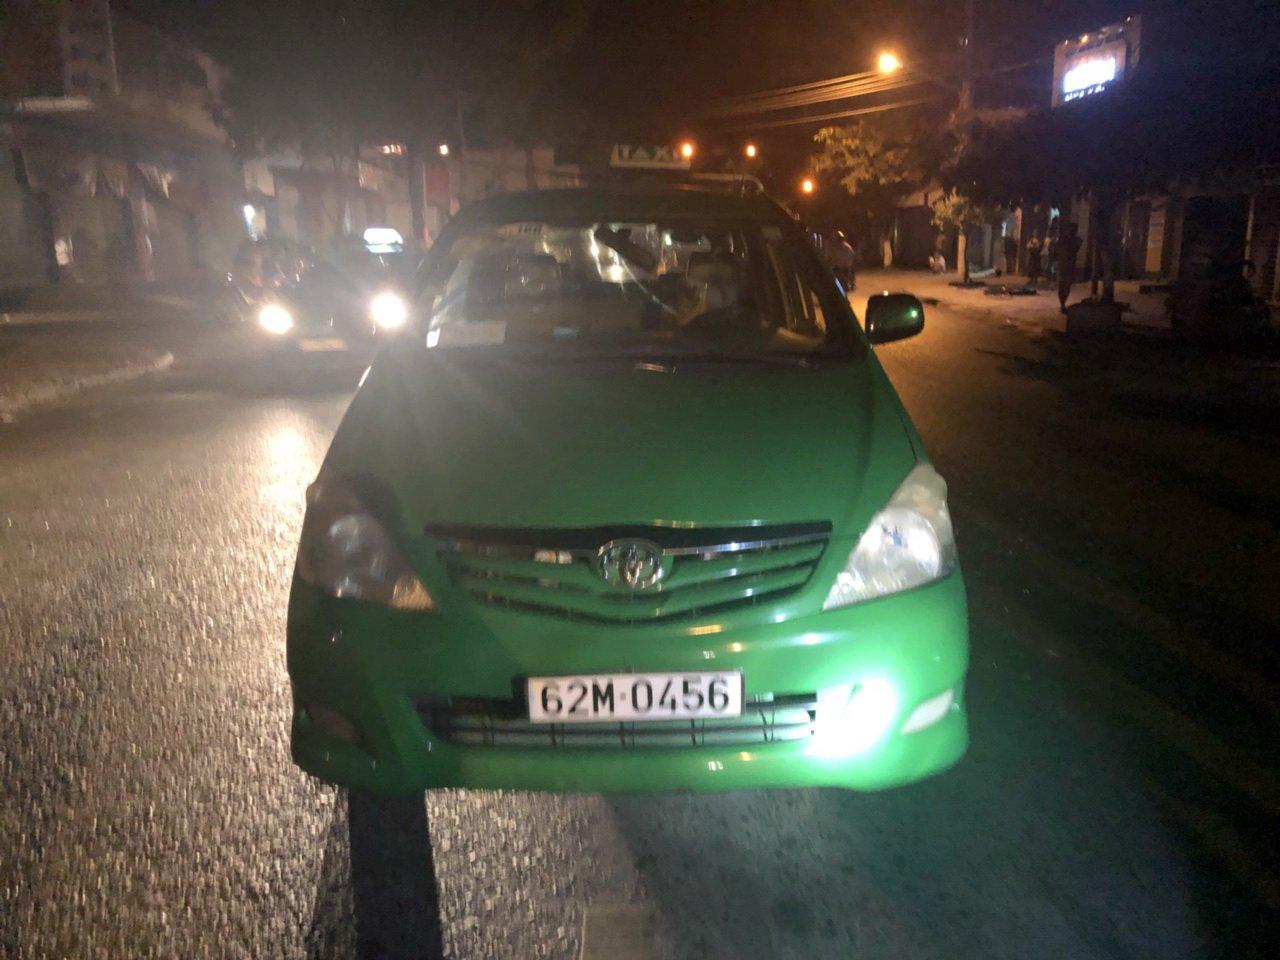 Nhom con do chan taxi chem hanh khach, ban tai xe hinh anh 2